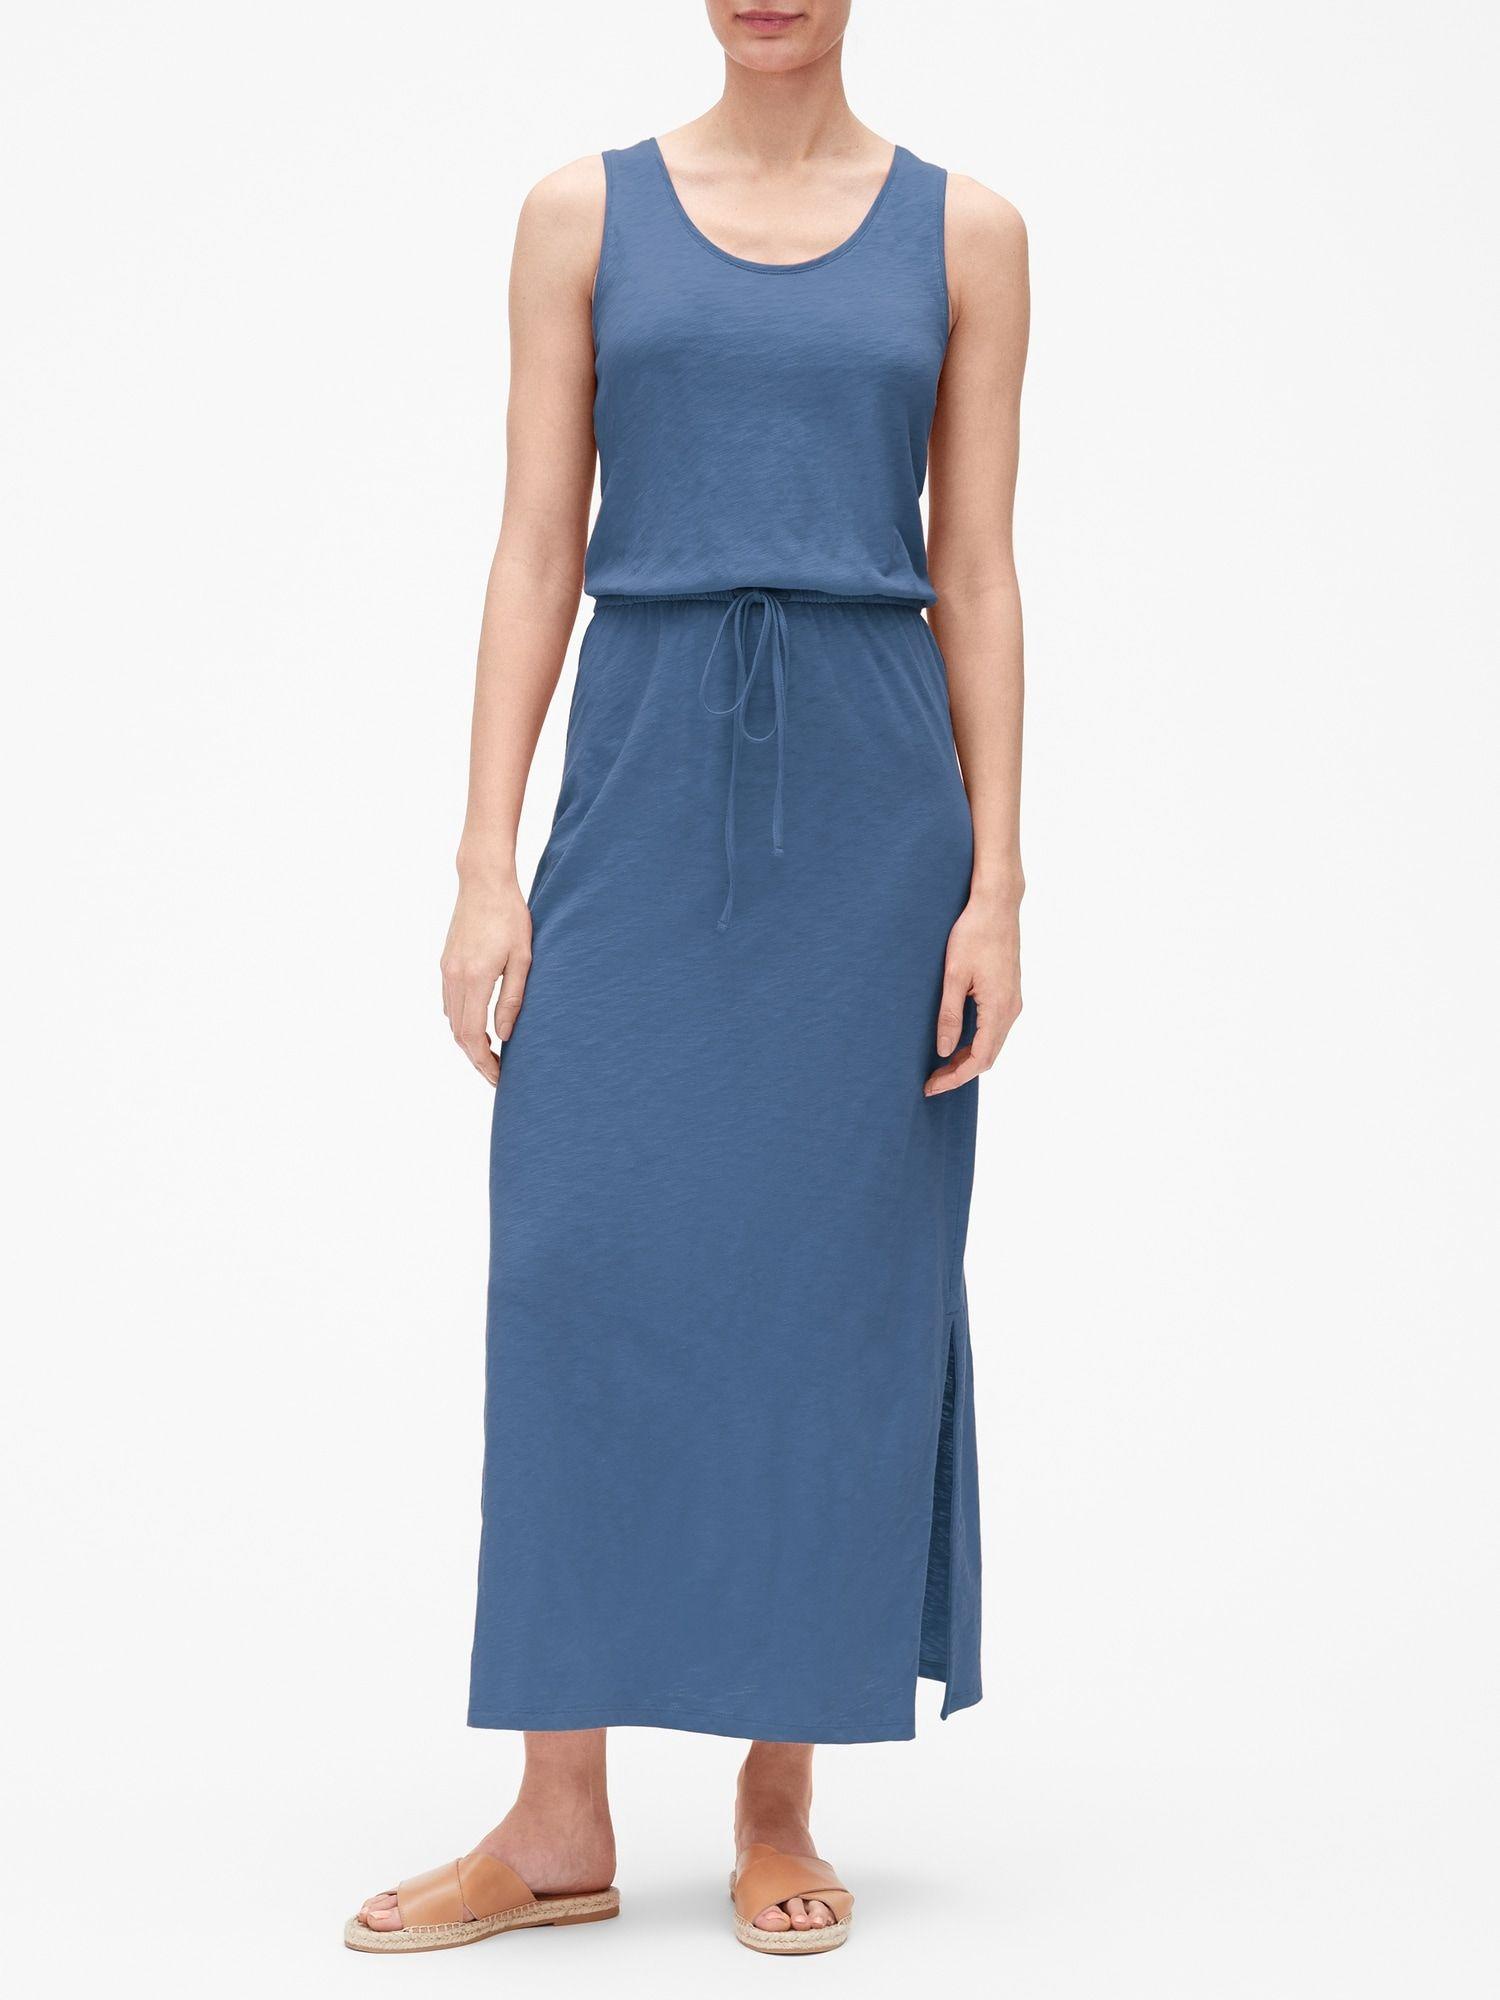 Tank Maxi Dress In Slub Jersey Gap Factory Maxi Tank Dress Dresses For Work Maxi Dress [ 2000 x 1500 Pixel ]